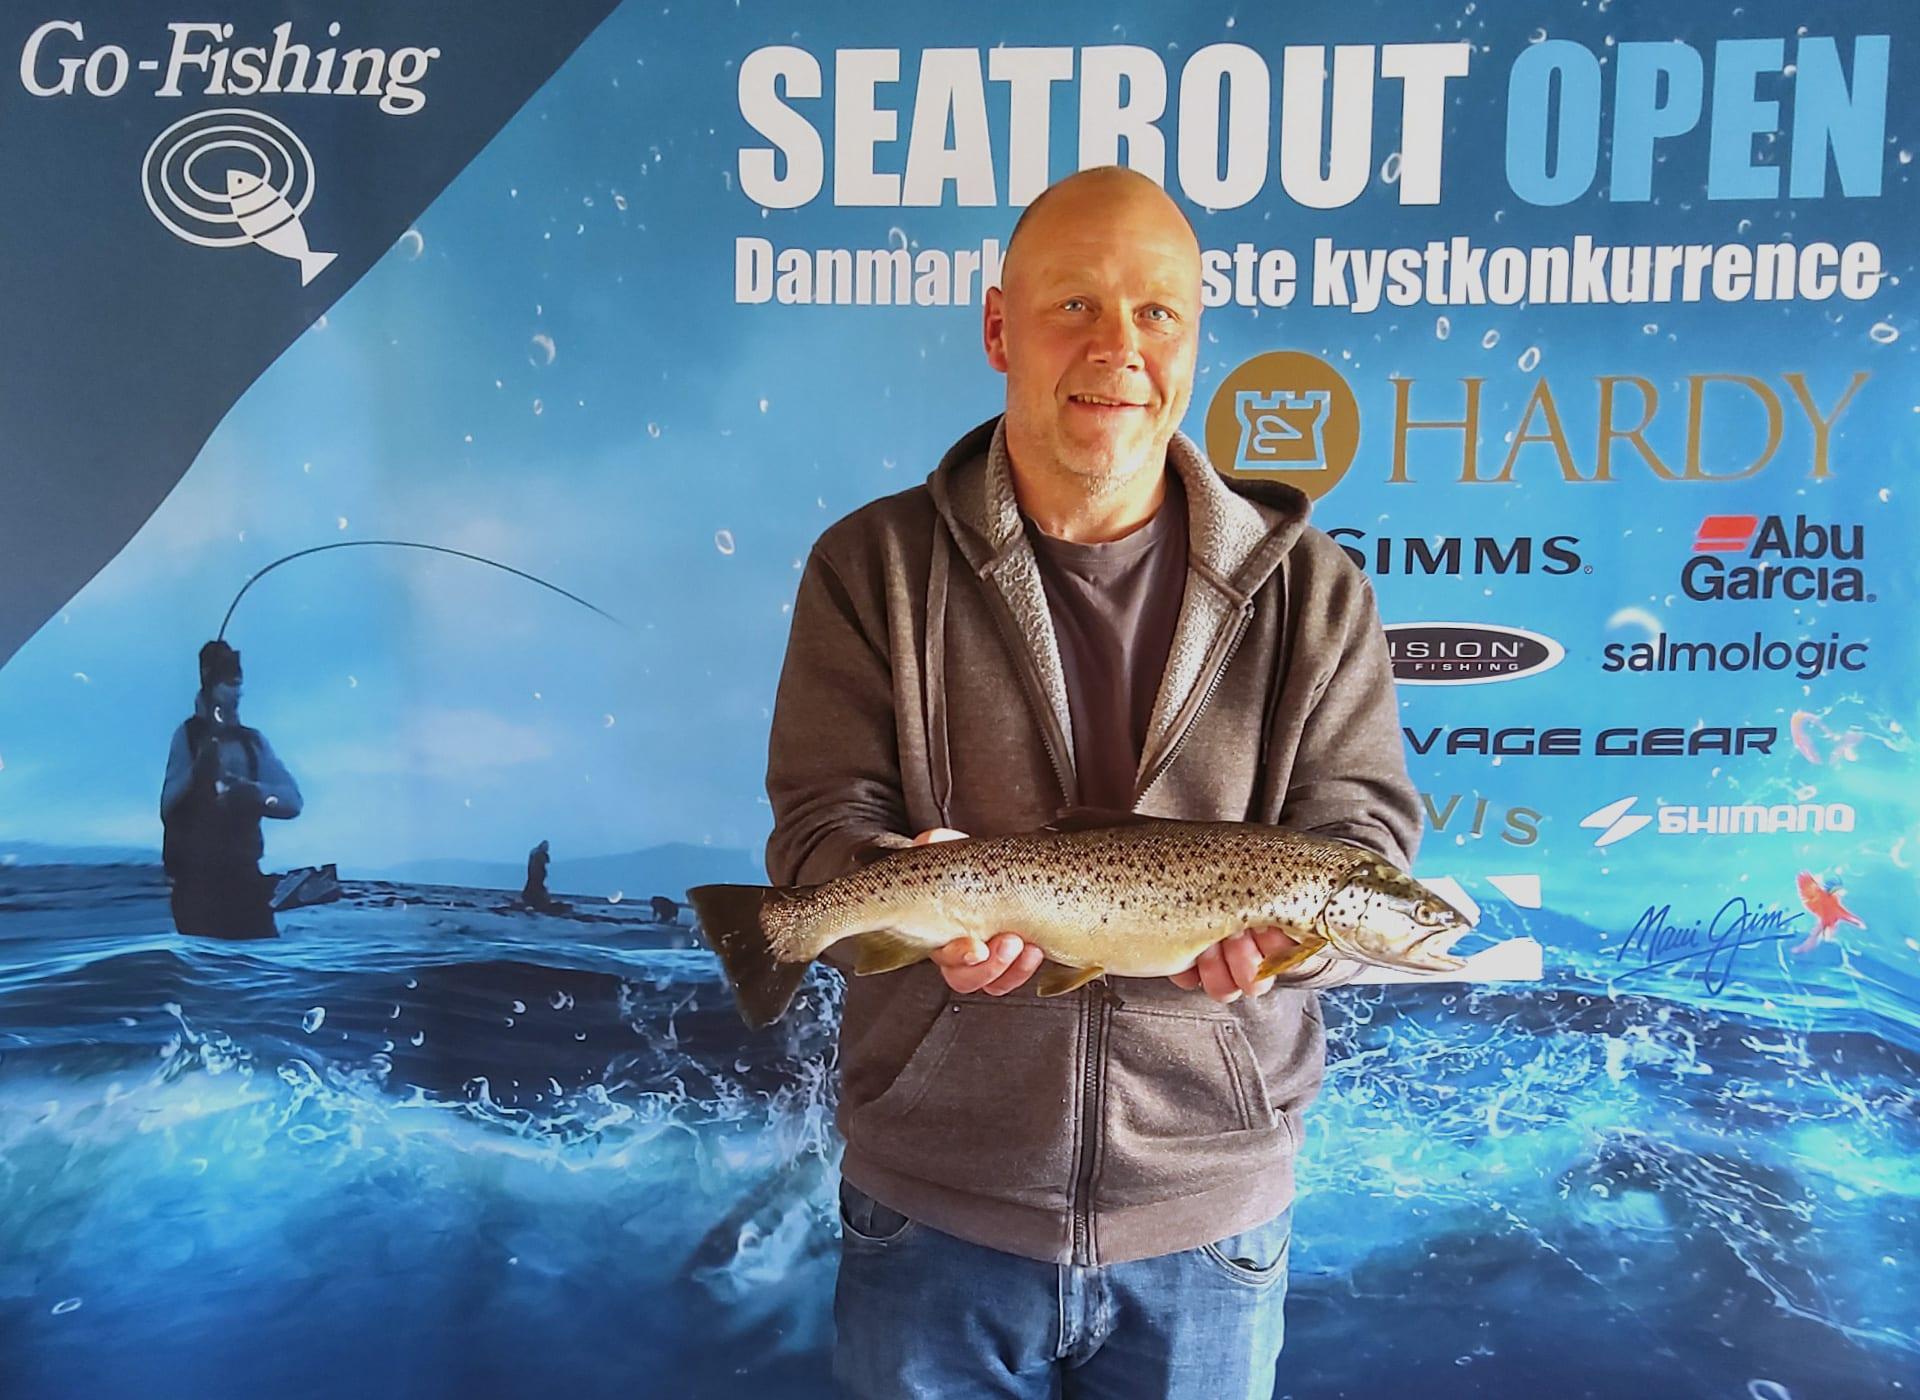 Seatrout Open deltager Steen Jæger